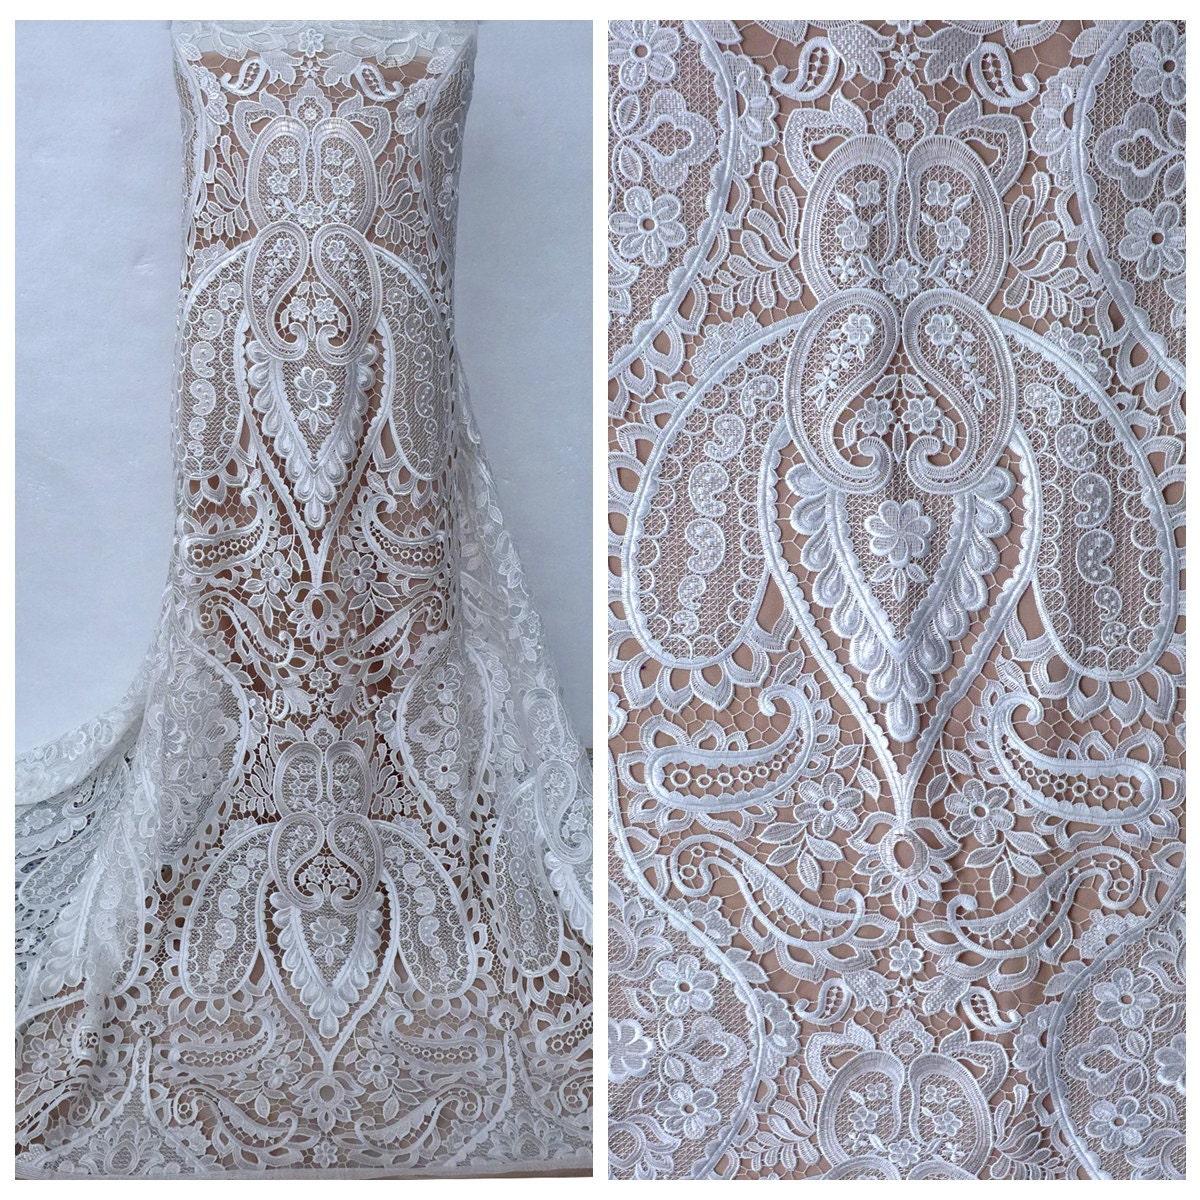 New must fashion black blue white wedding dress lace fabric for White lace fabric for wedding dresses